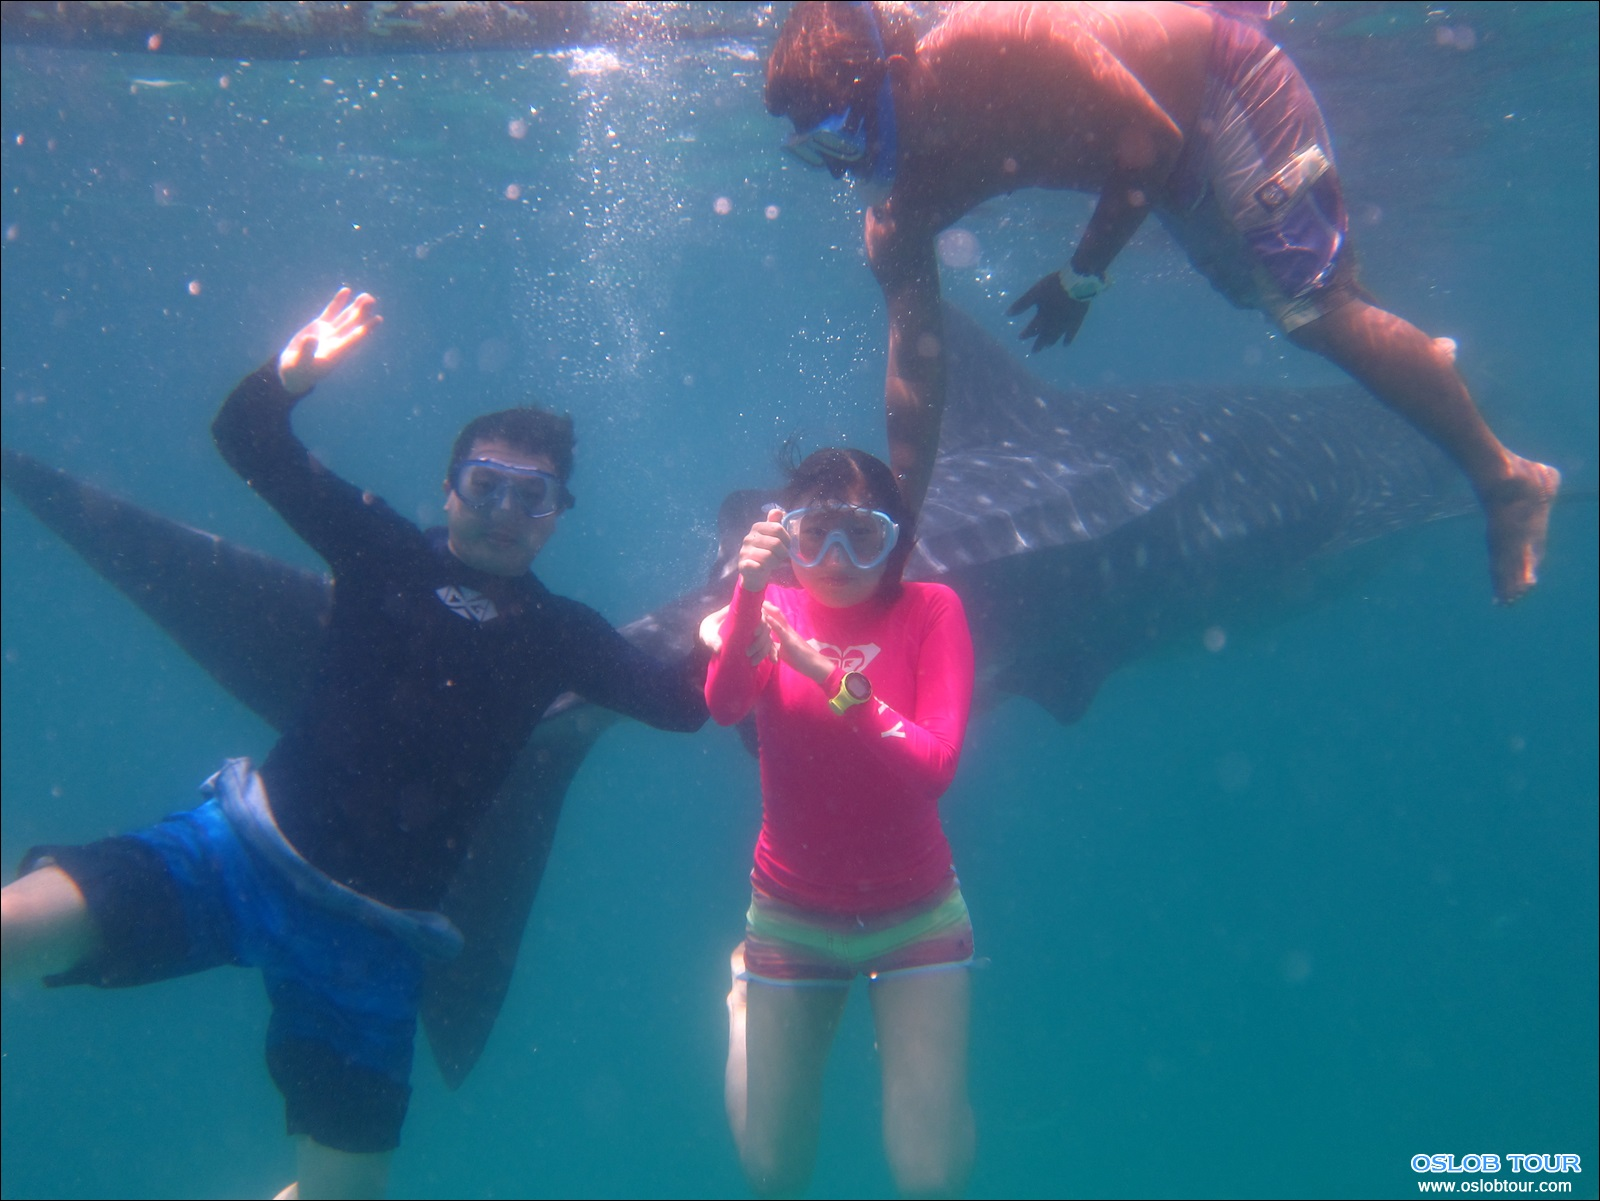 cebu oslob whale shark watching day tour 6 aug 2014 oslob tour